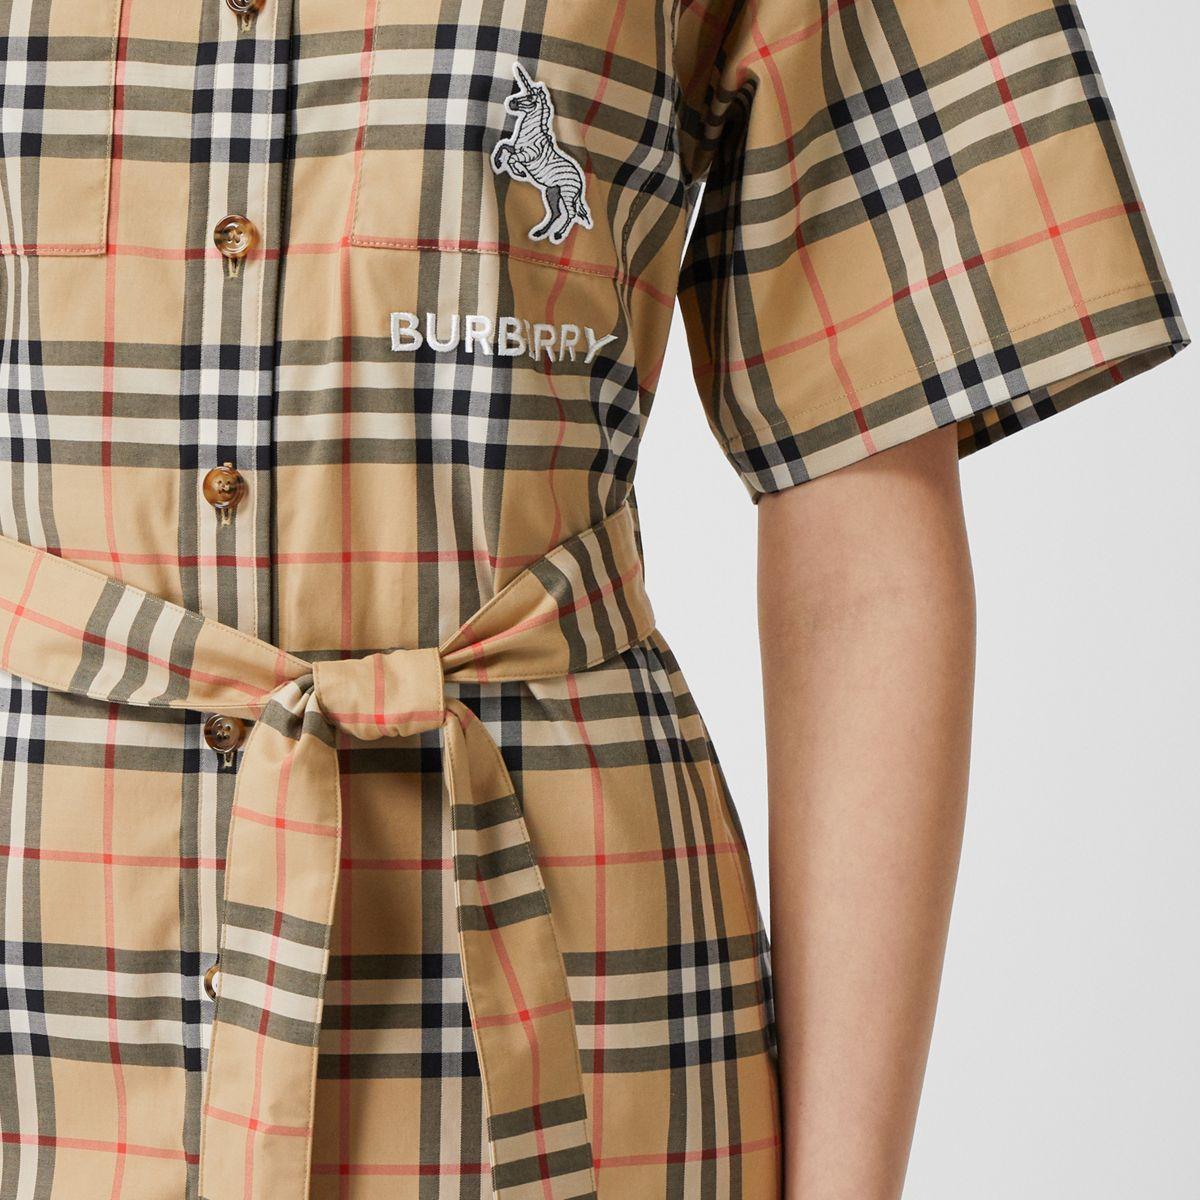 Burberry Zebra Applique Vintage Check Cotton Twill Shirt Dress Lyst